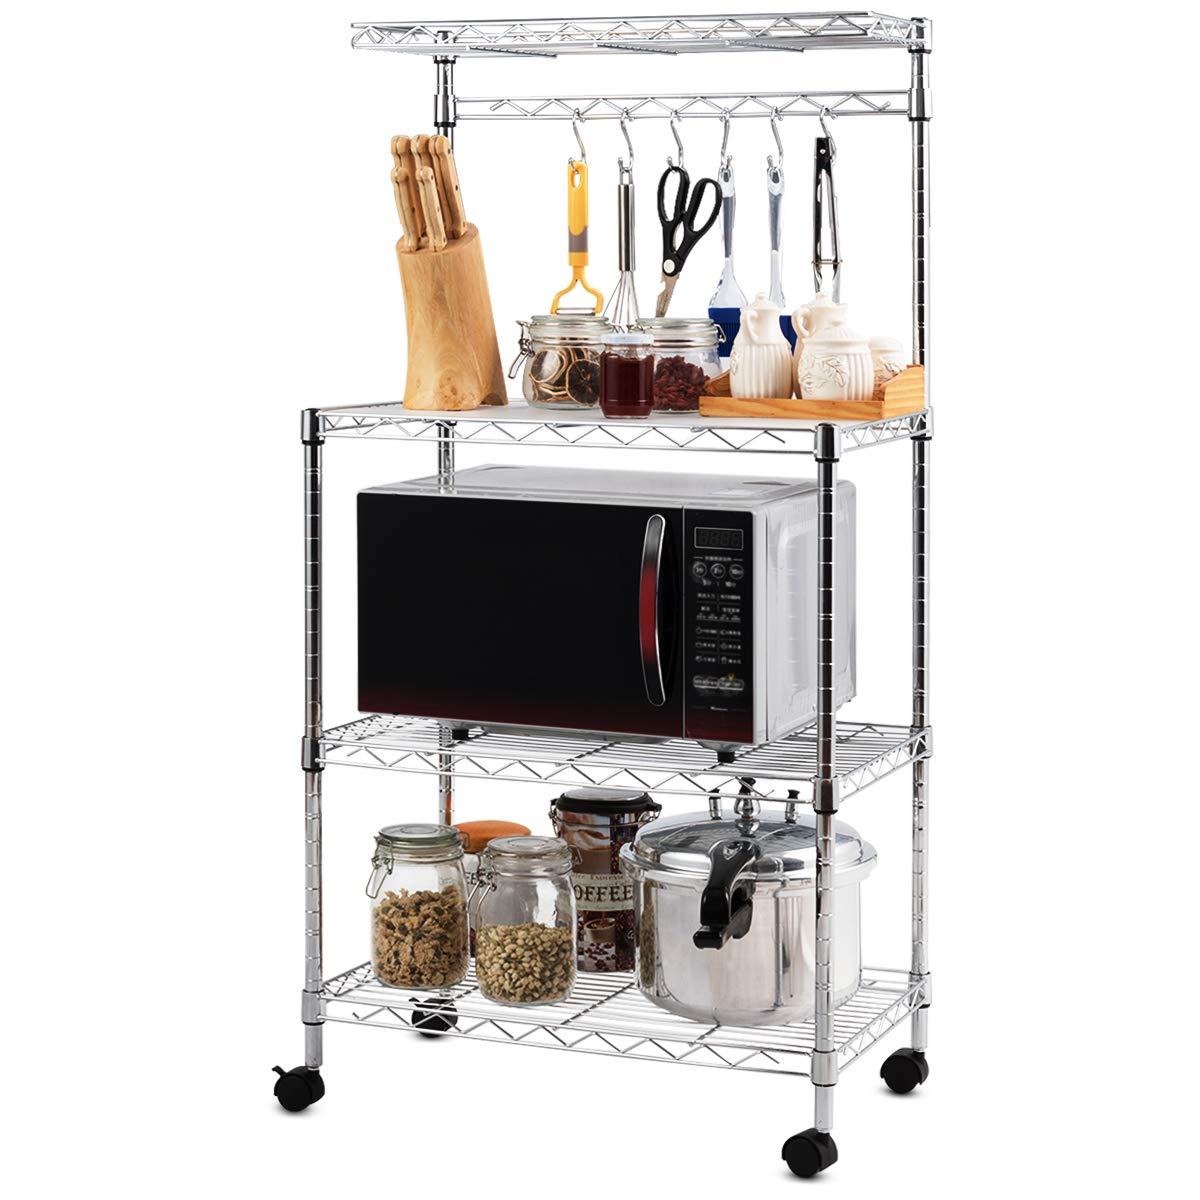 Giantex 4-Tier Baker's Rack Microwave Rack Free Standing Storage Shelf Microwave Oven Stand Kitchen Cart Storage Organizer Shelf Workstation w/Adjustable Shelf and 6 Hooks